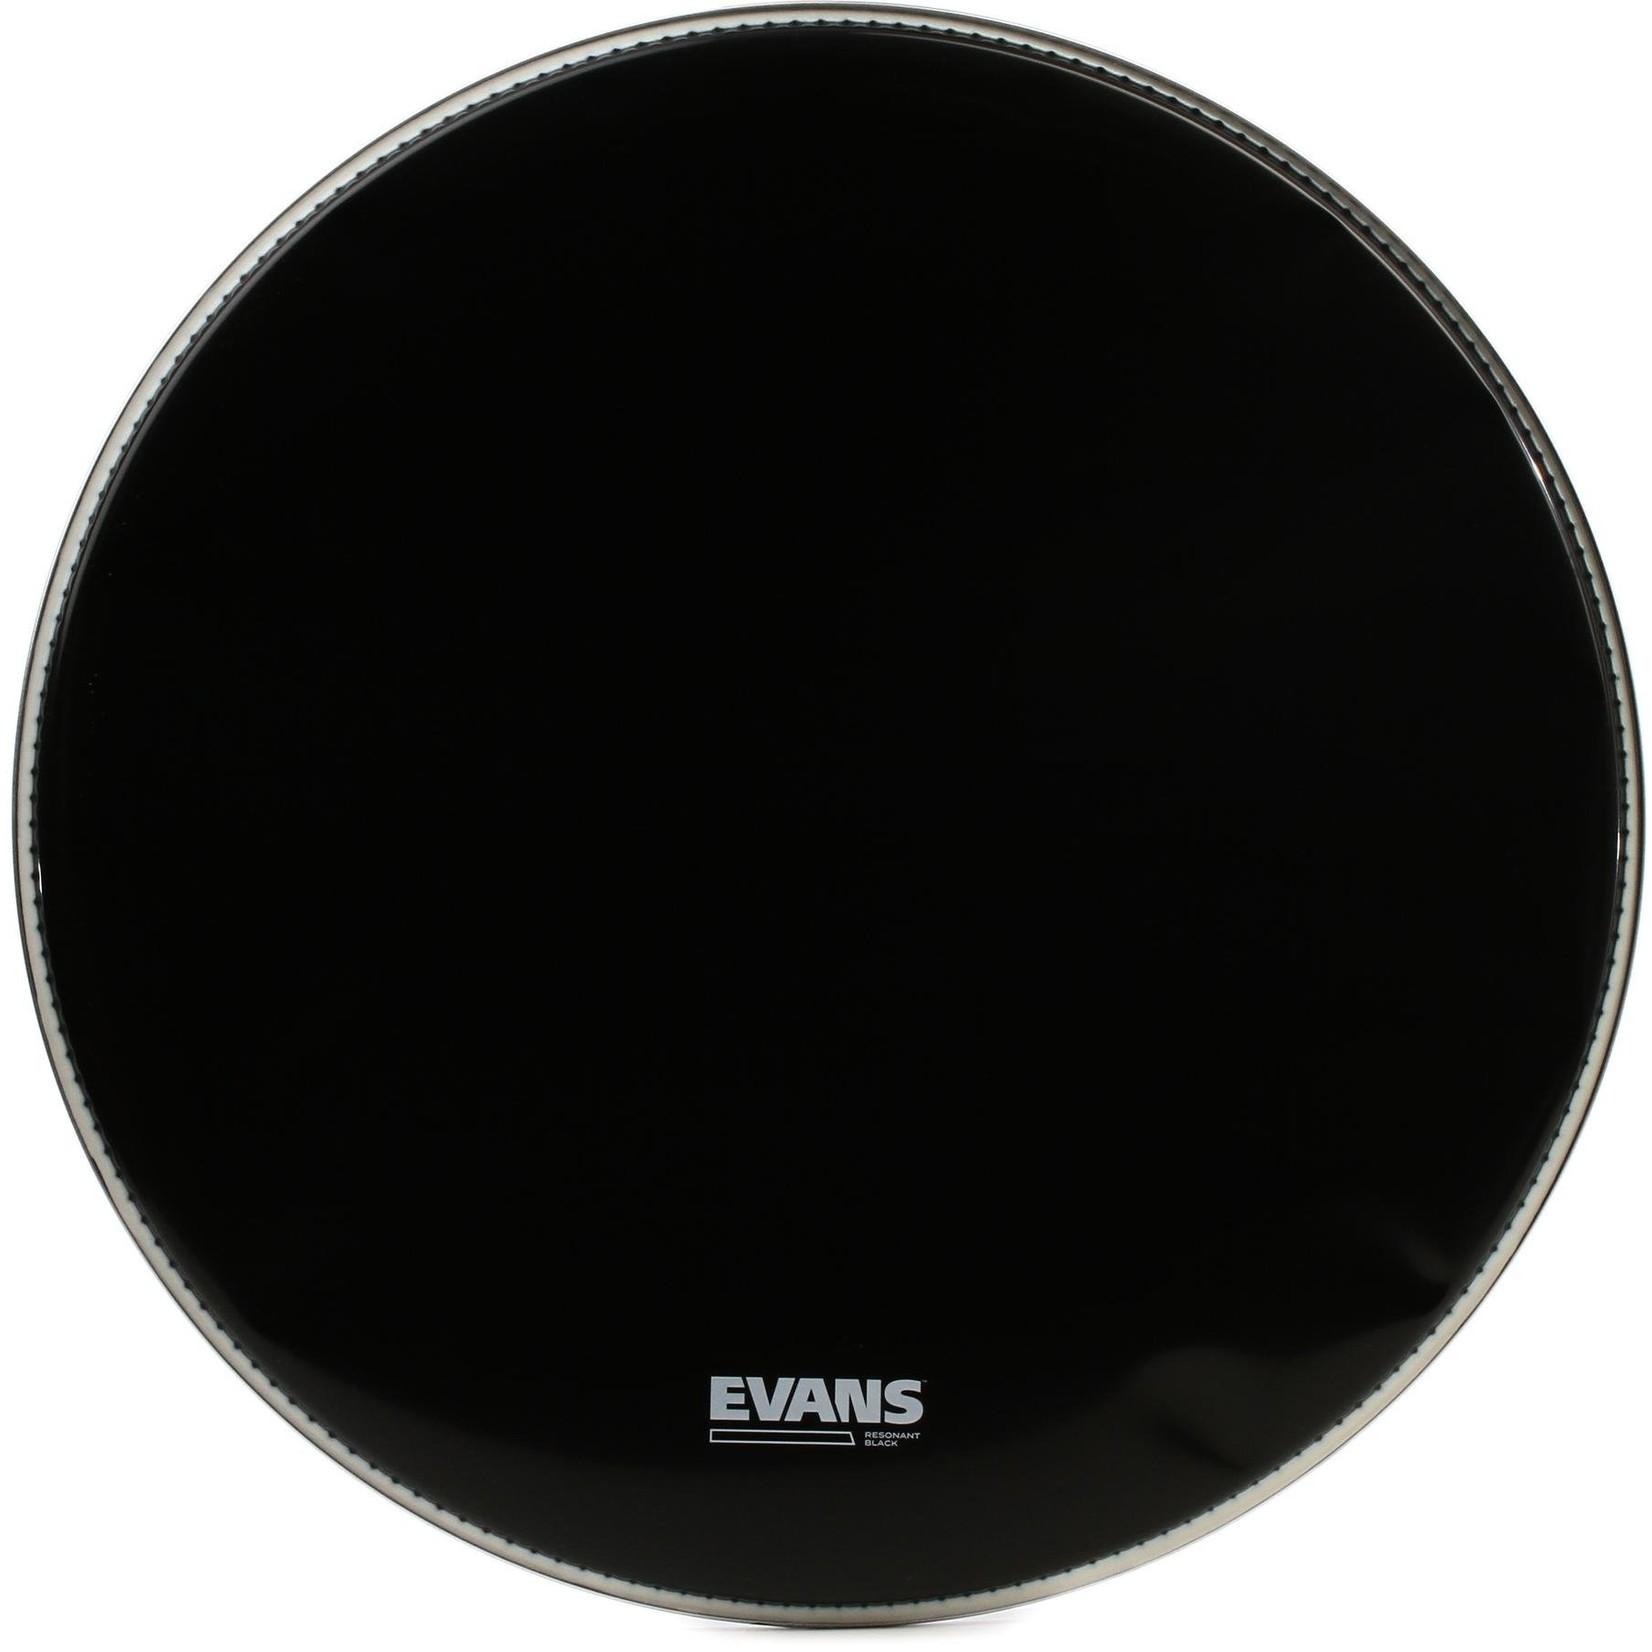 Evans Evans Reso Black Bass Drum